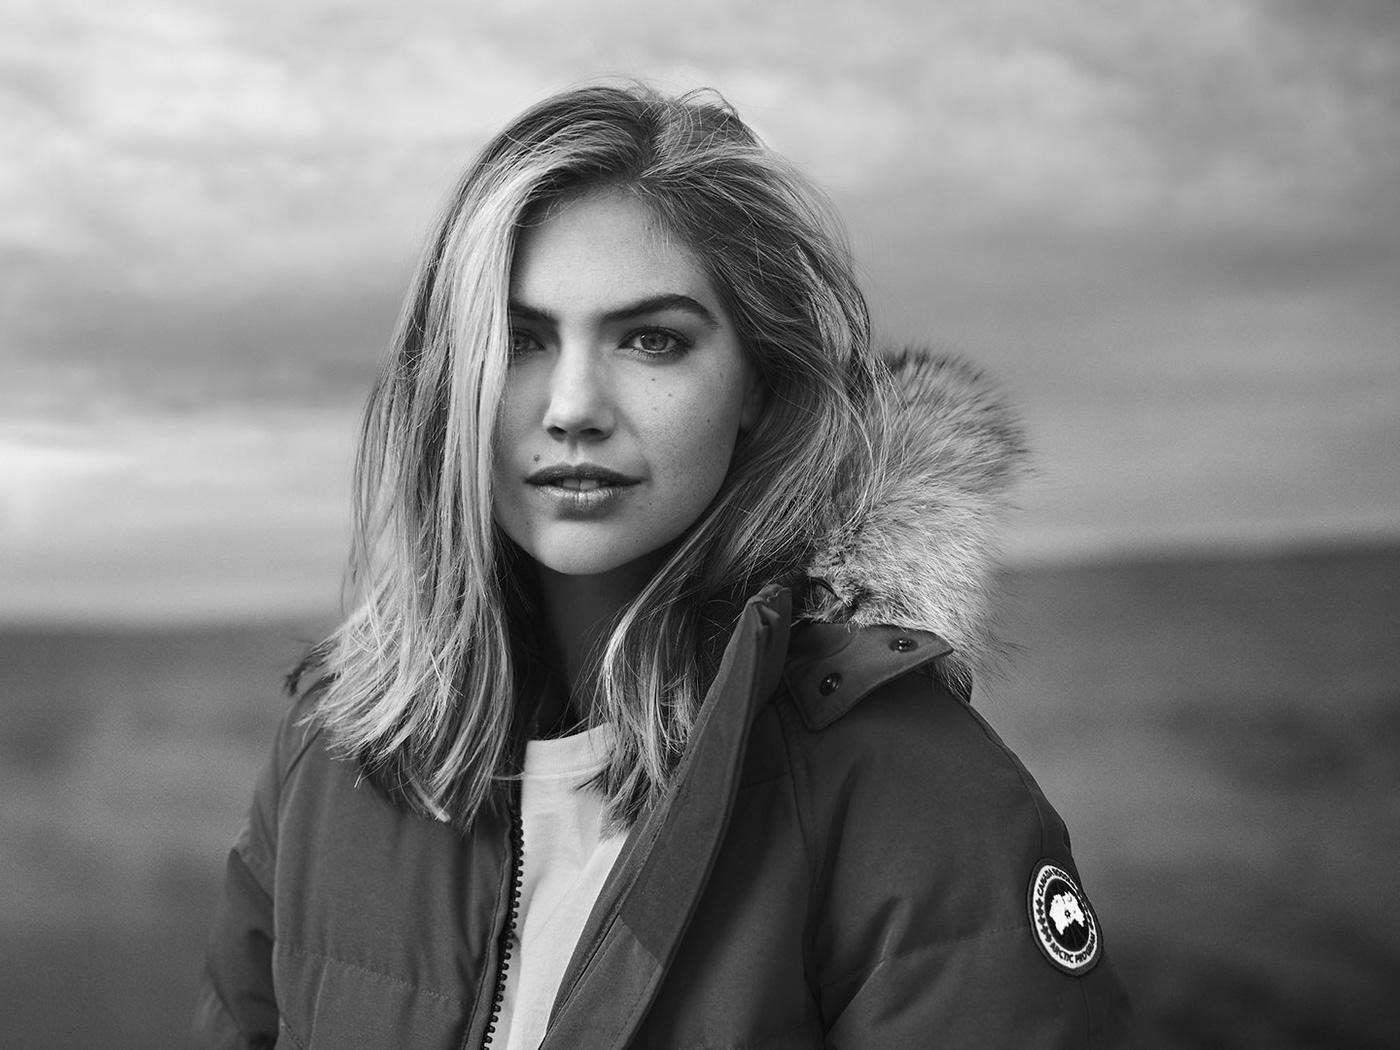 Kate Upton Canada Goose On Behance